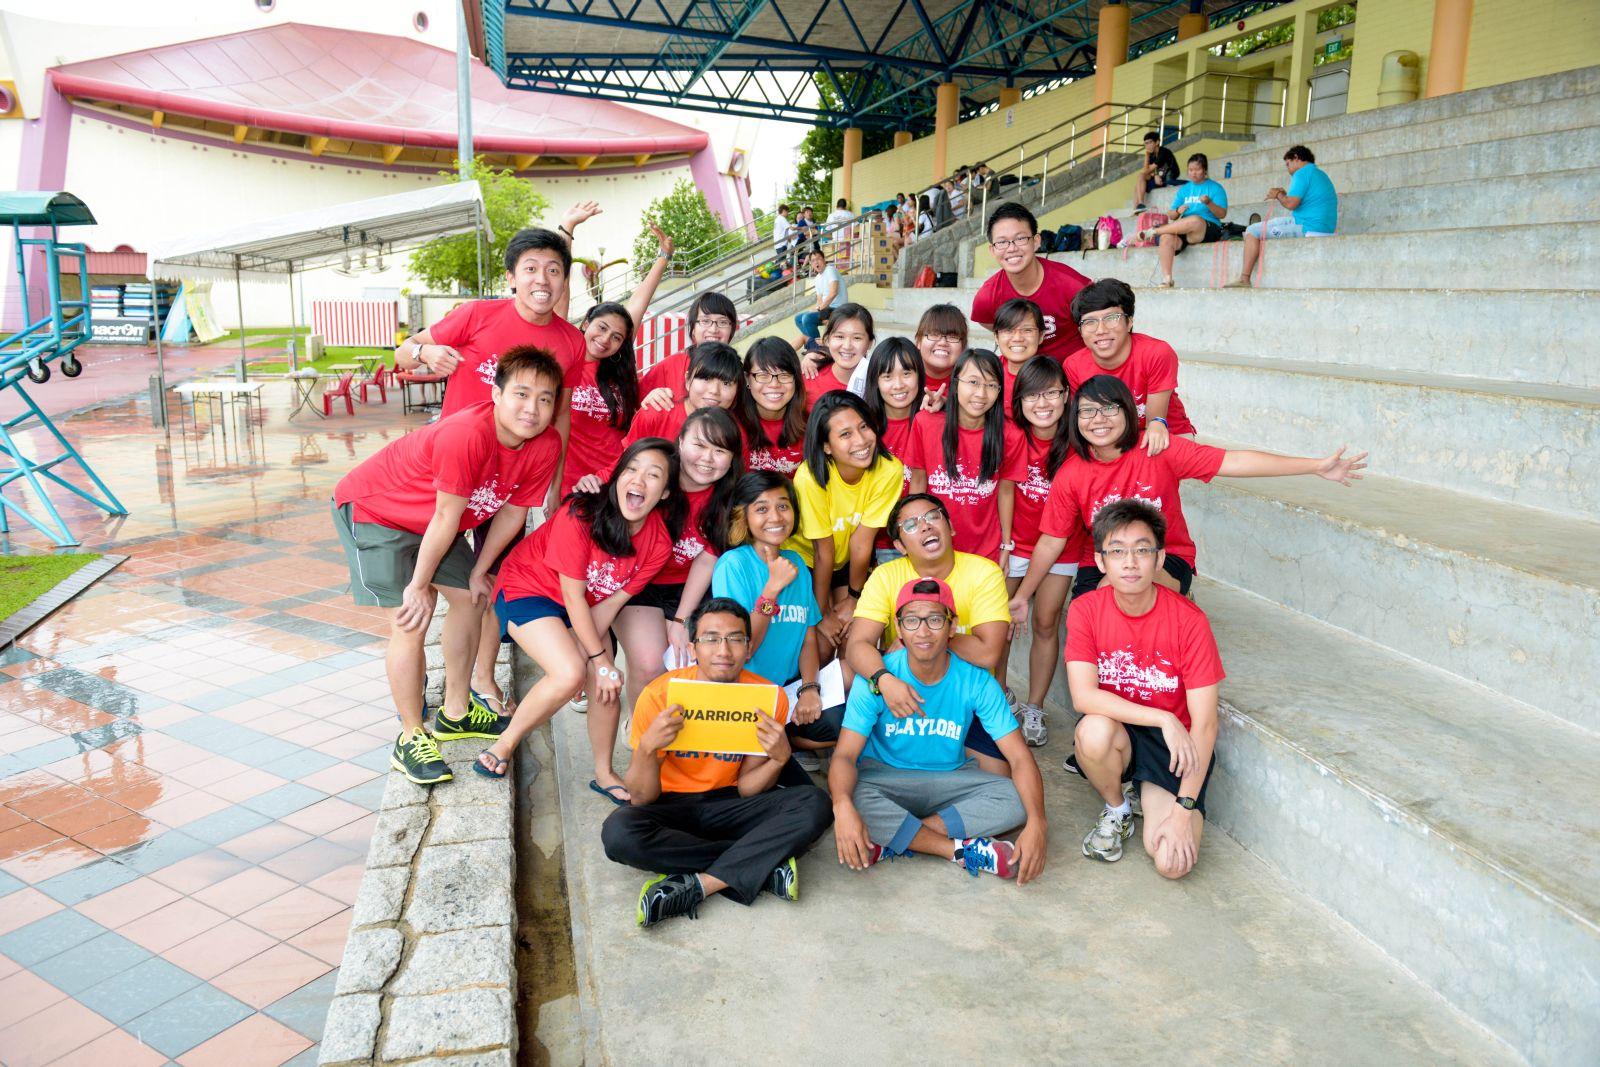 Club Rainbow Singapore Annual Party 2014 -8.jpg